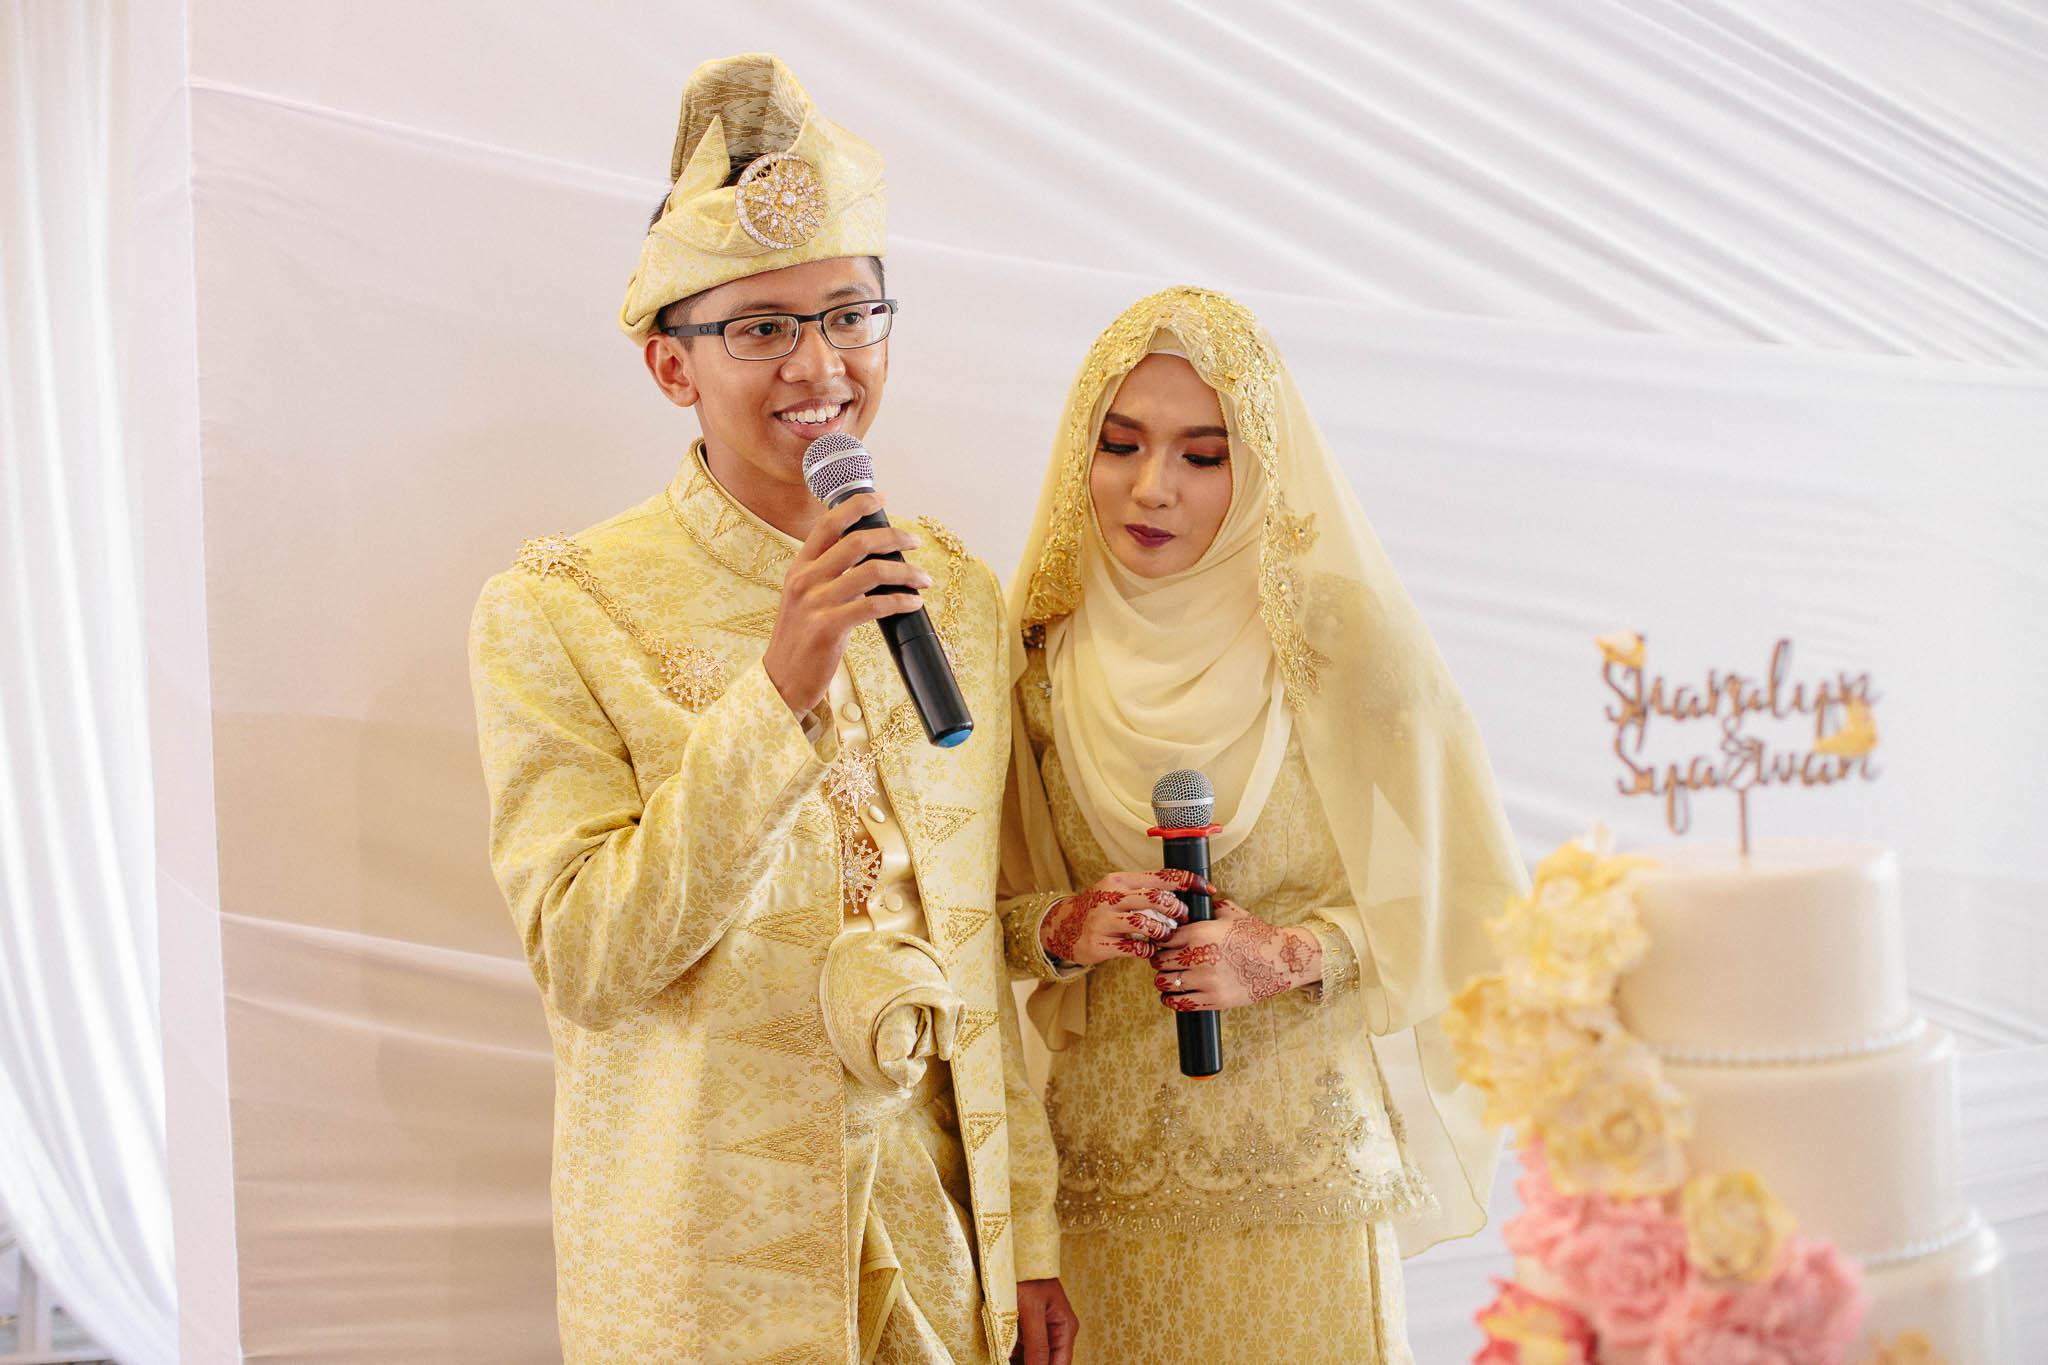 singapore-wedding-photographer-sharalyn-syazwan-046.jpg